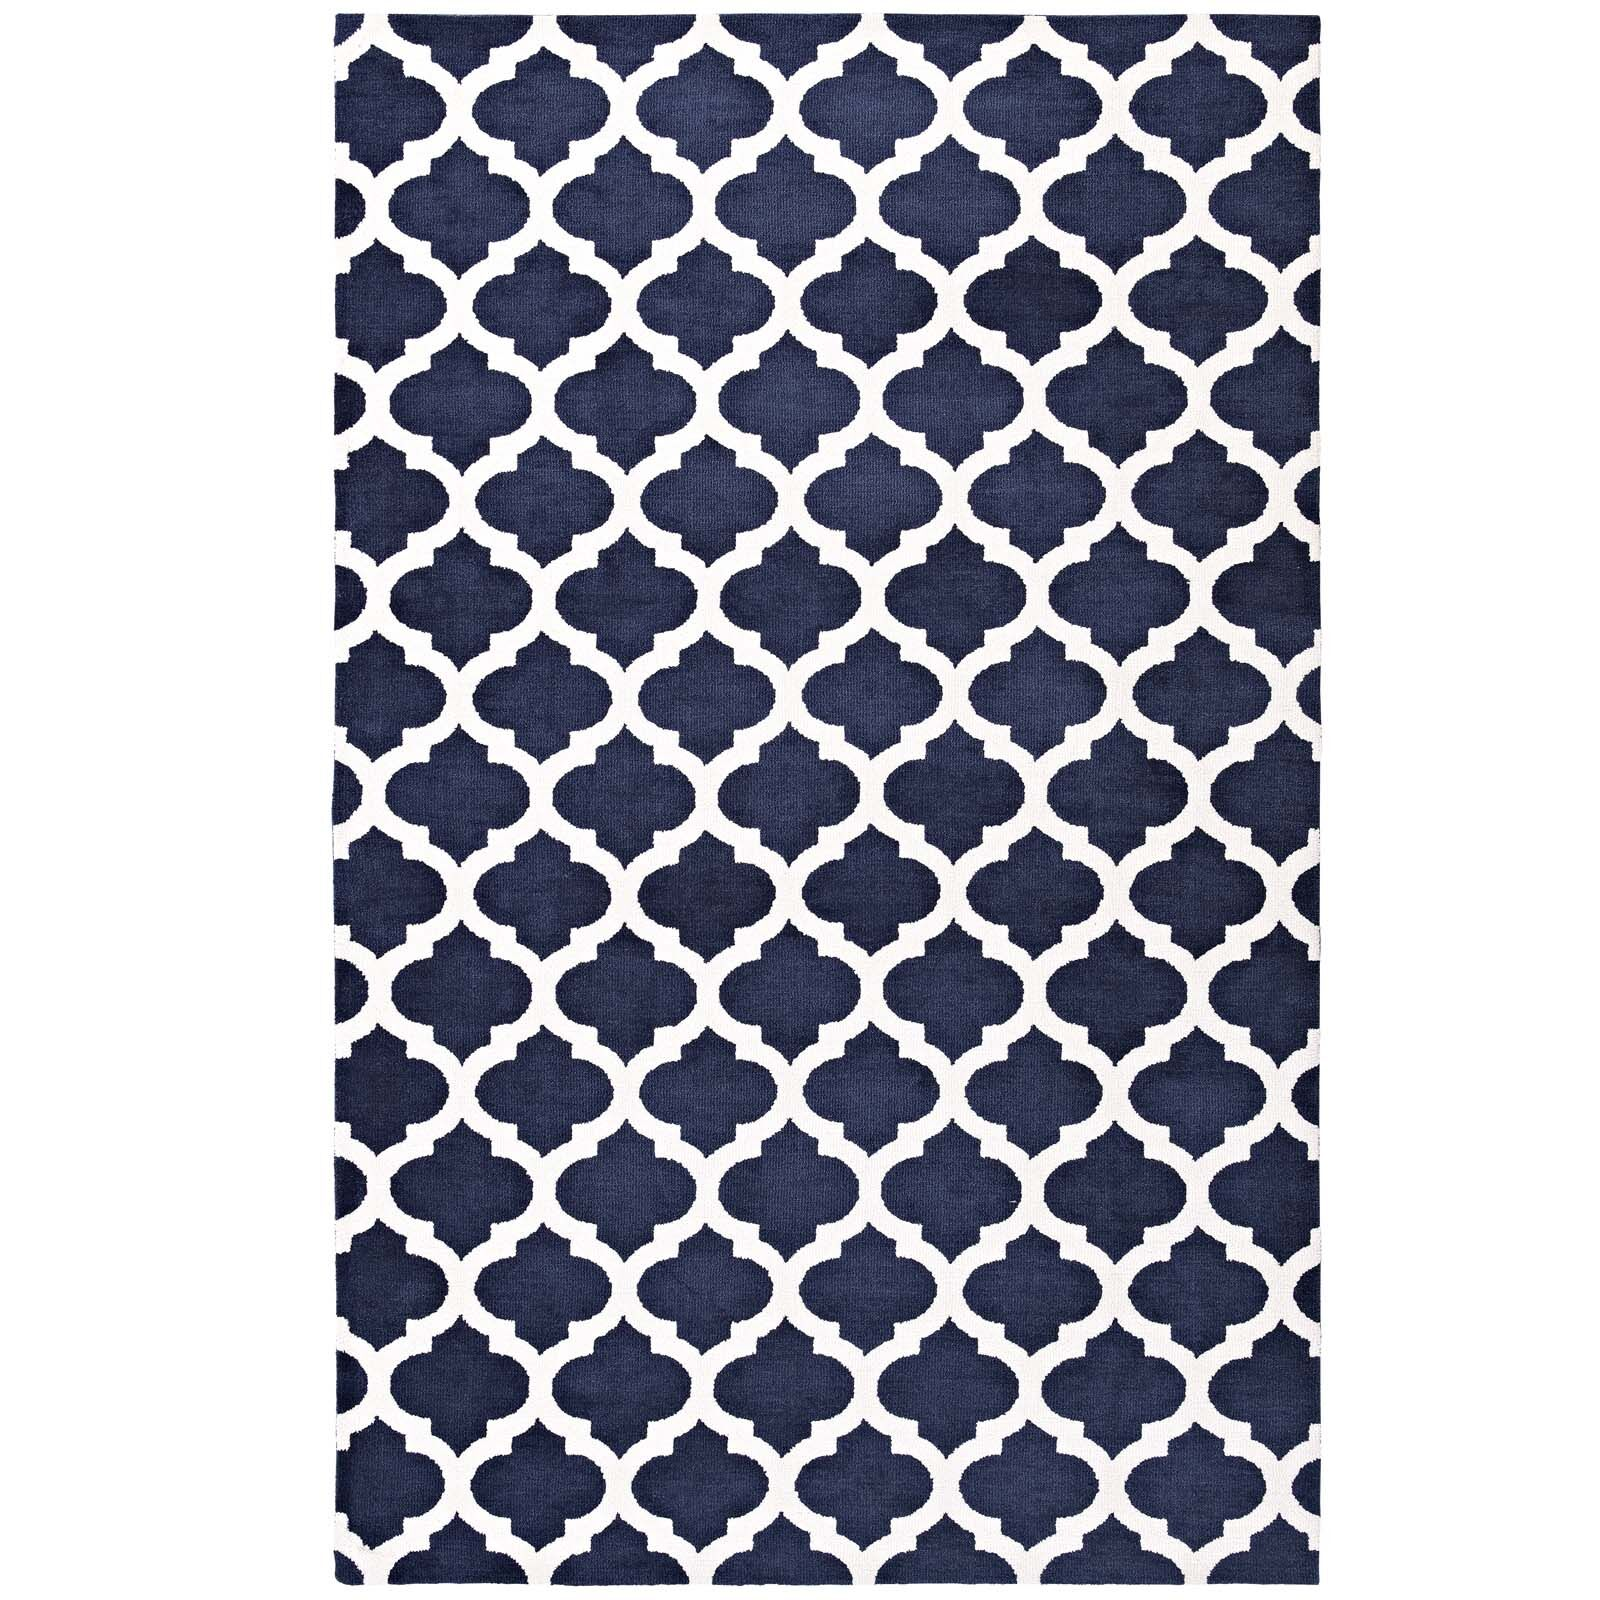 Tusten Moroccan Trellis Navy/Ivory Area Rug Rug Size: Rectangle 5' x 8'